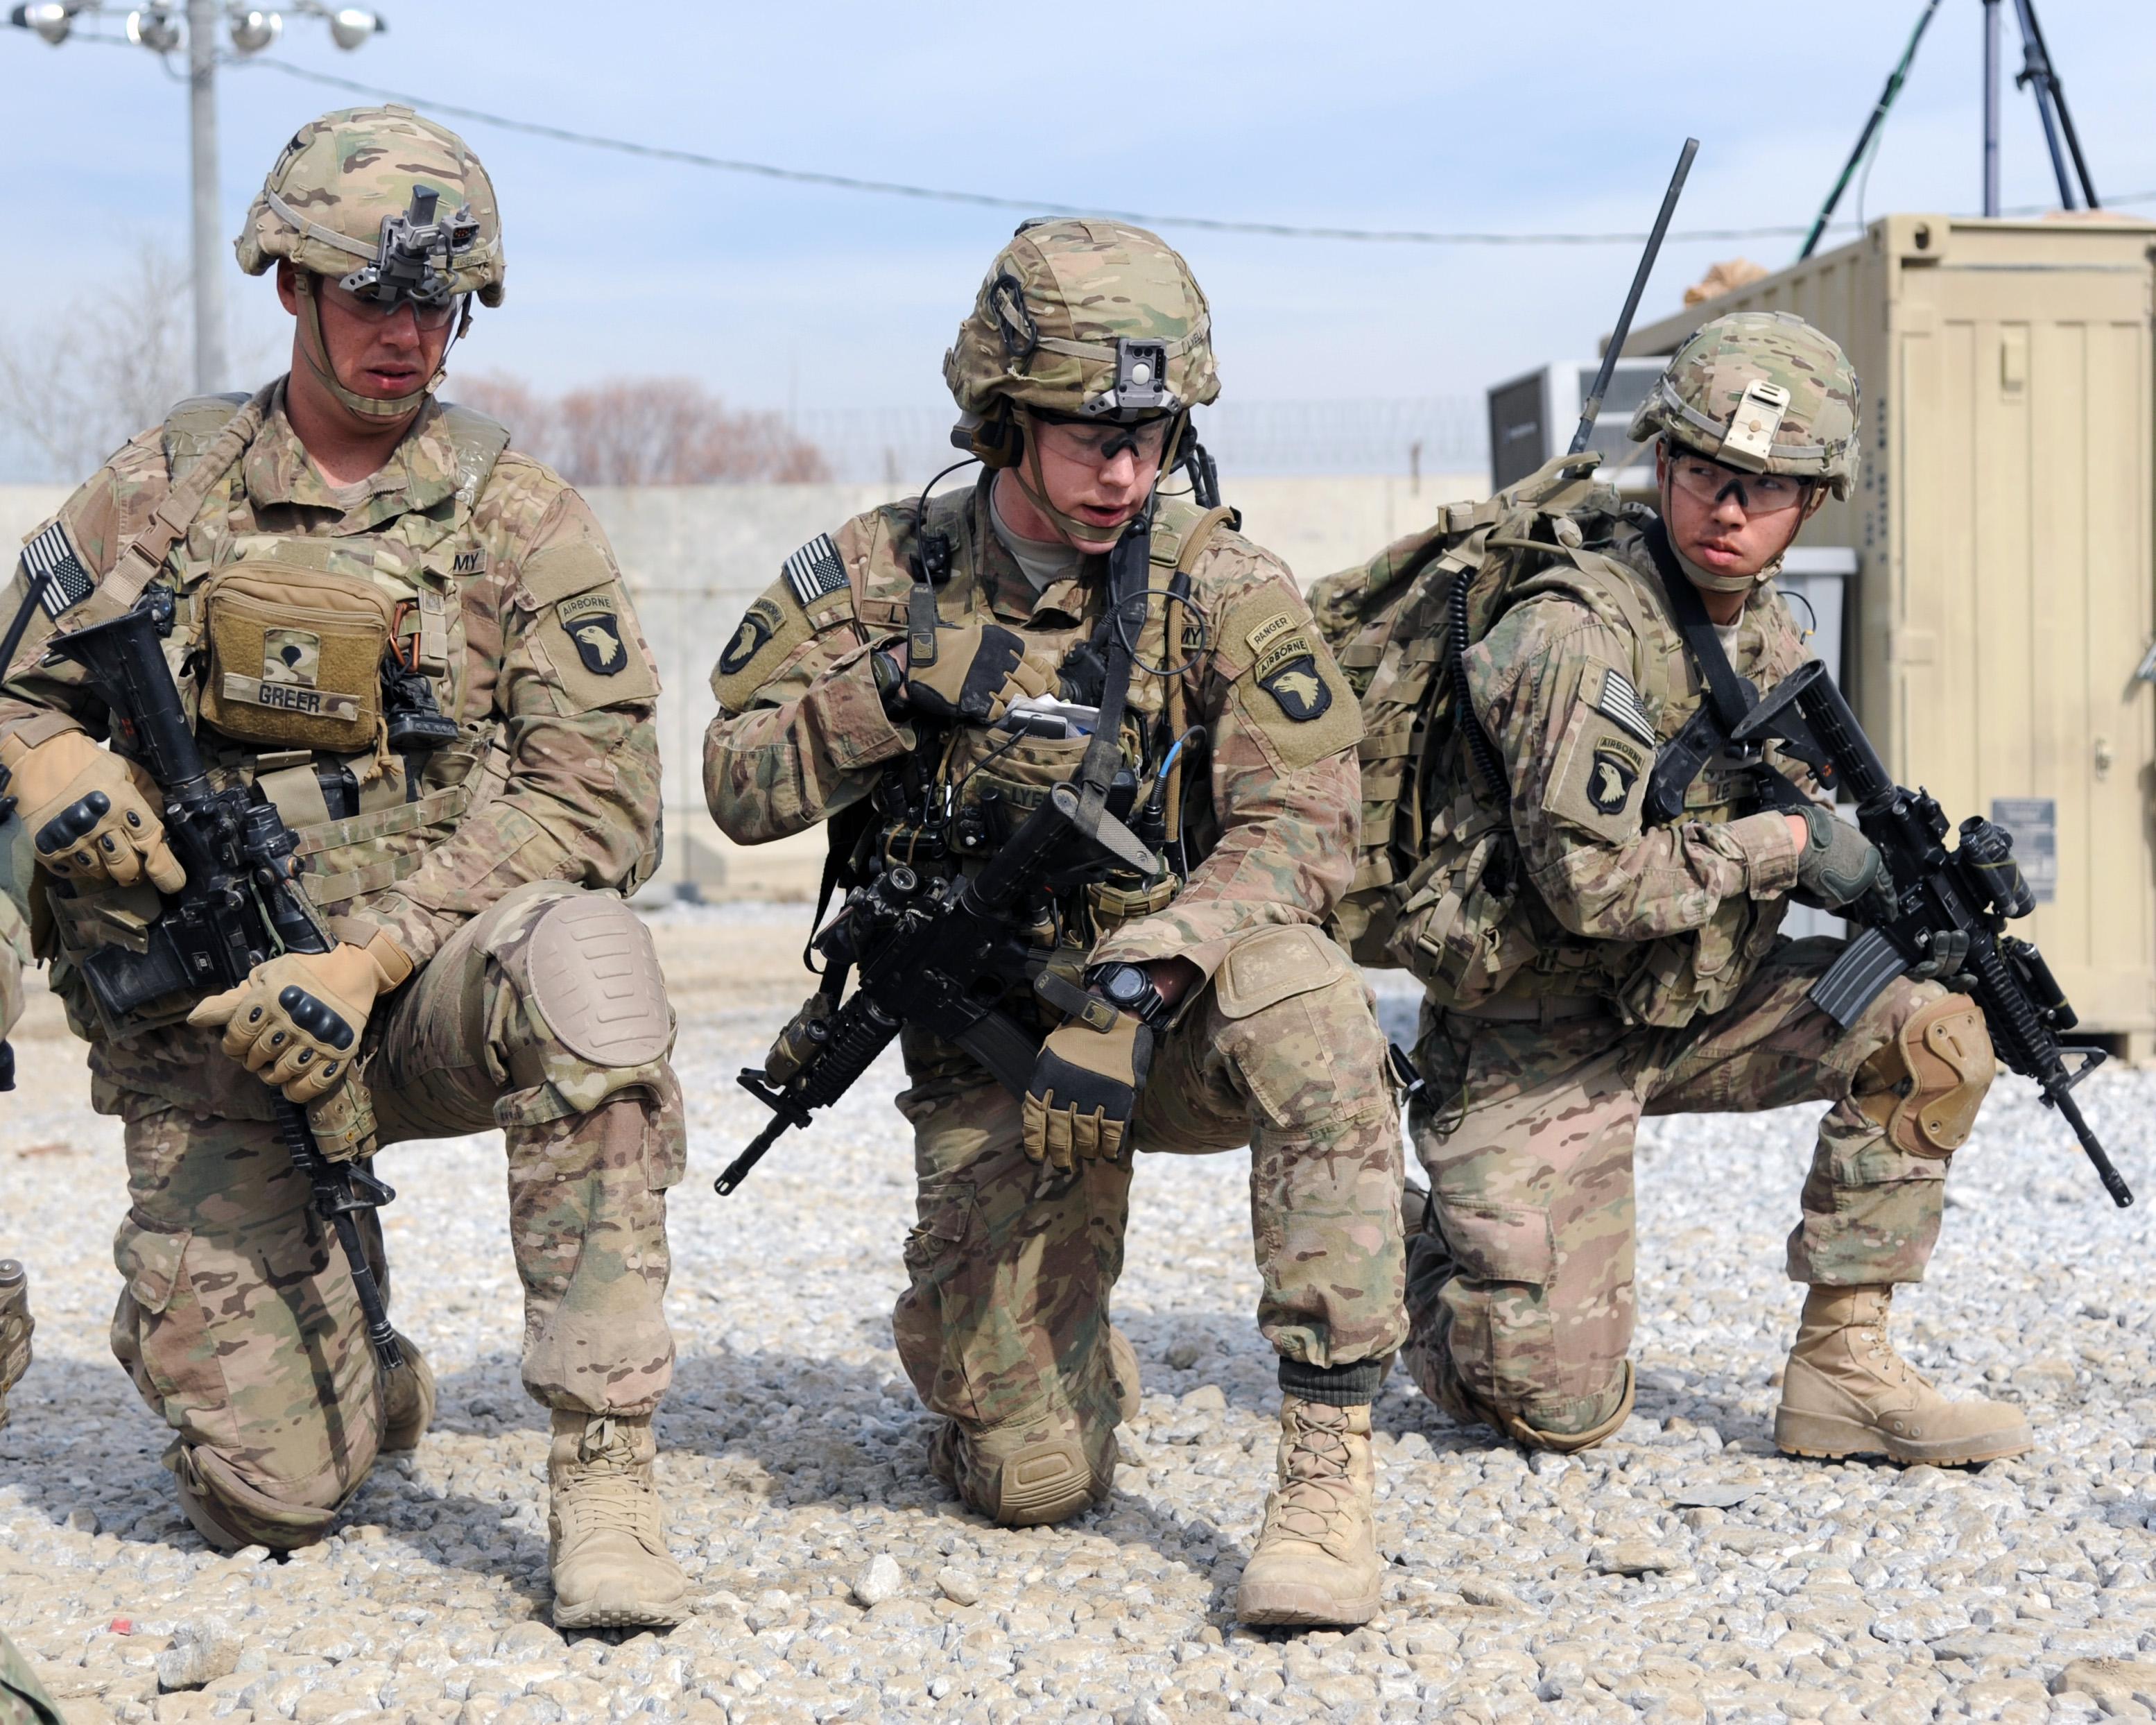 us army soldier scorpion multicam w2ocp 2016